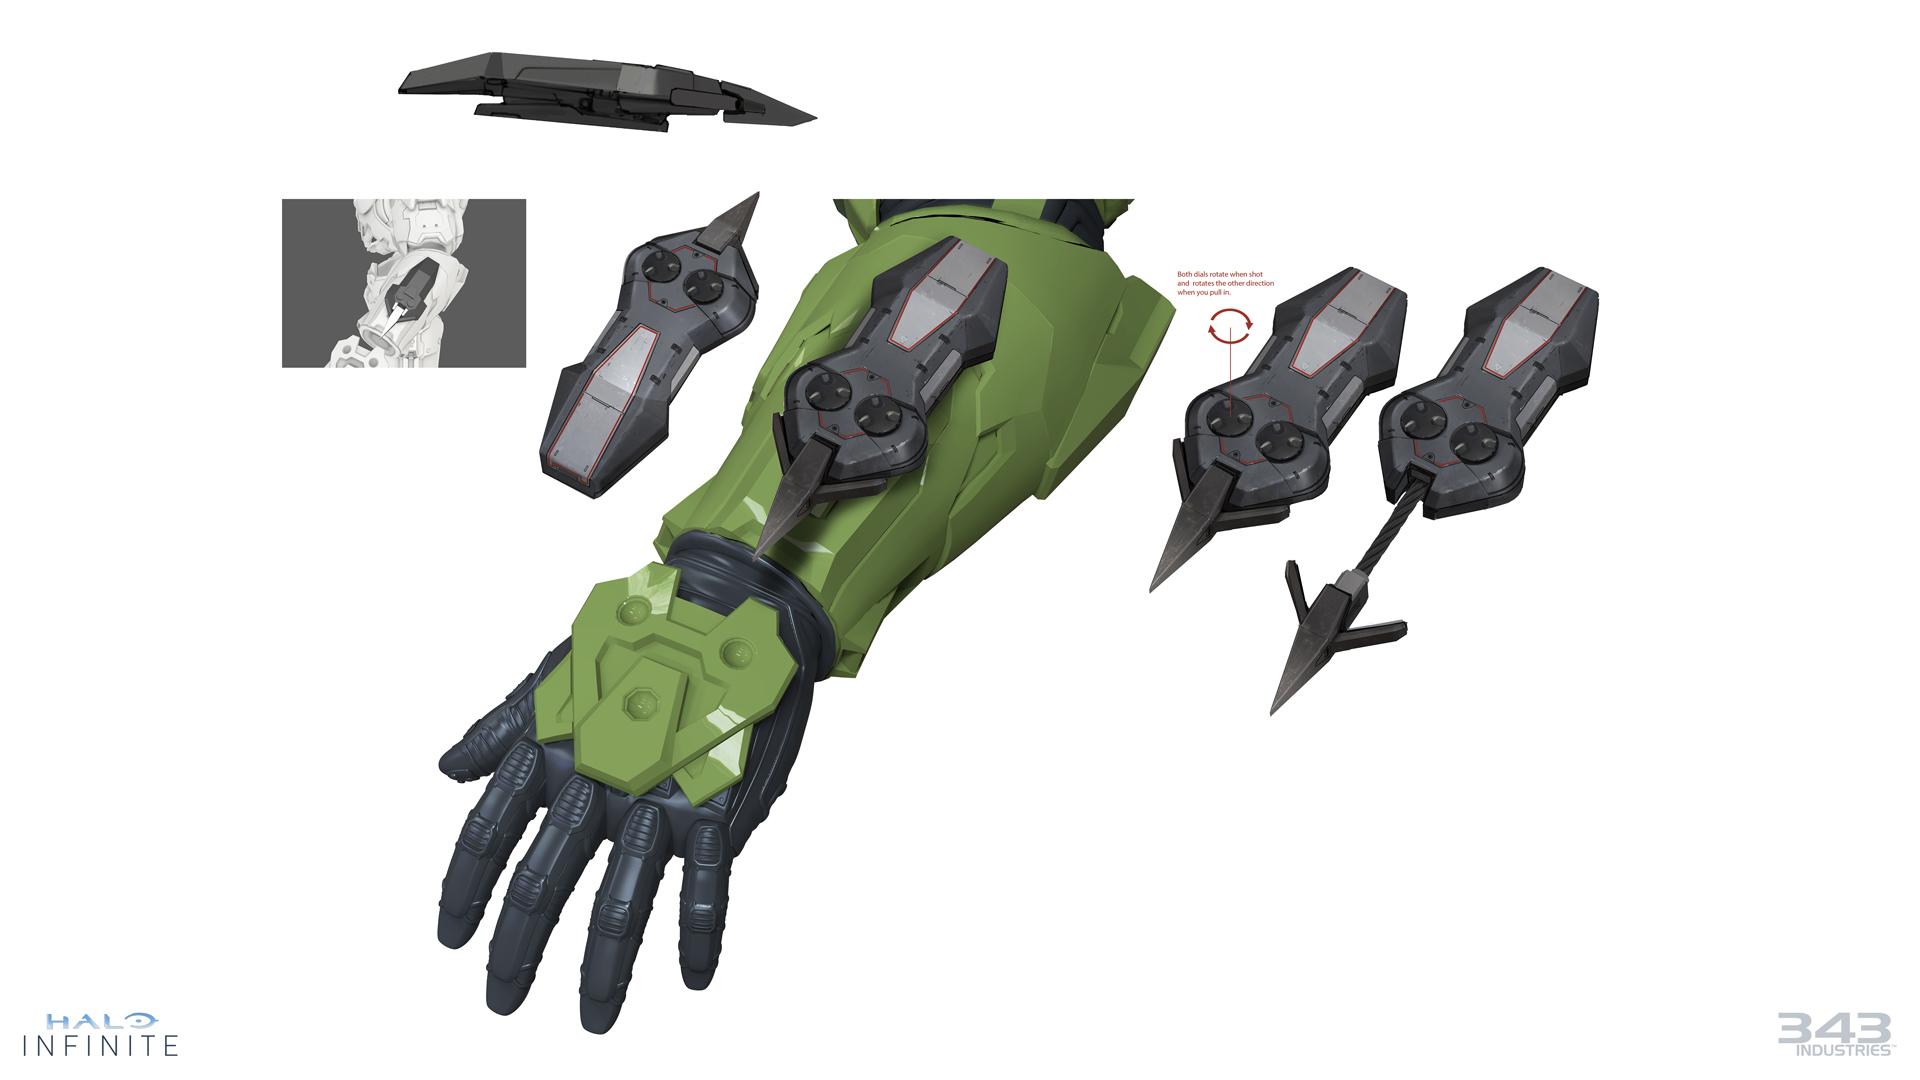 Halo Infinite's Grappleshot